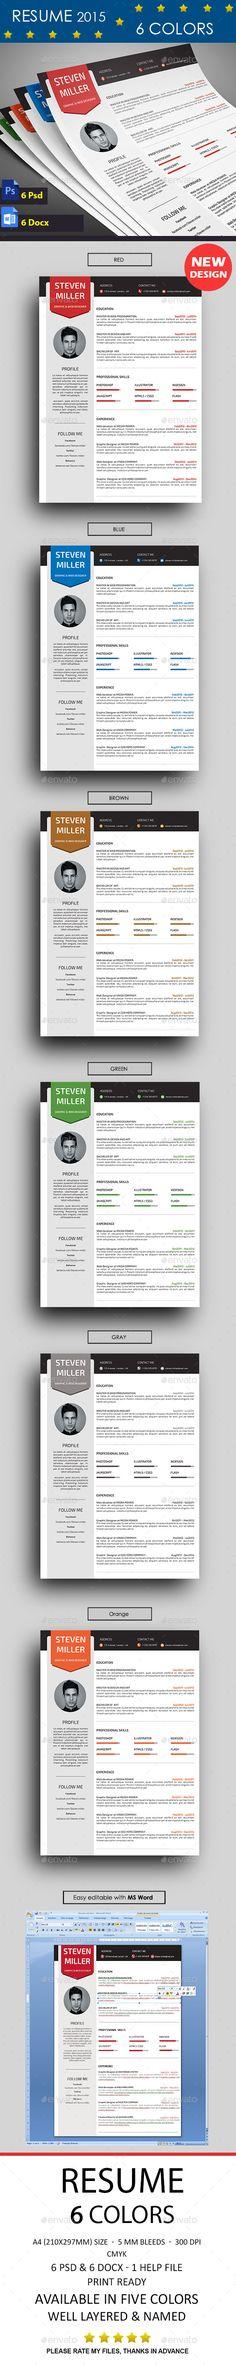 Related to design multimedia print education school vision studio - resume design templates